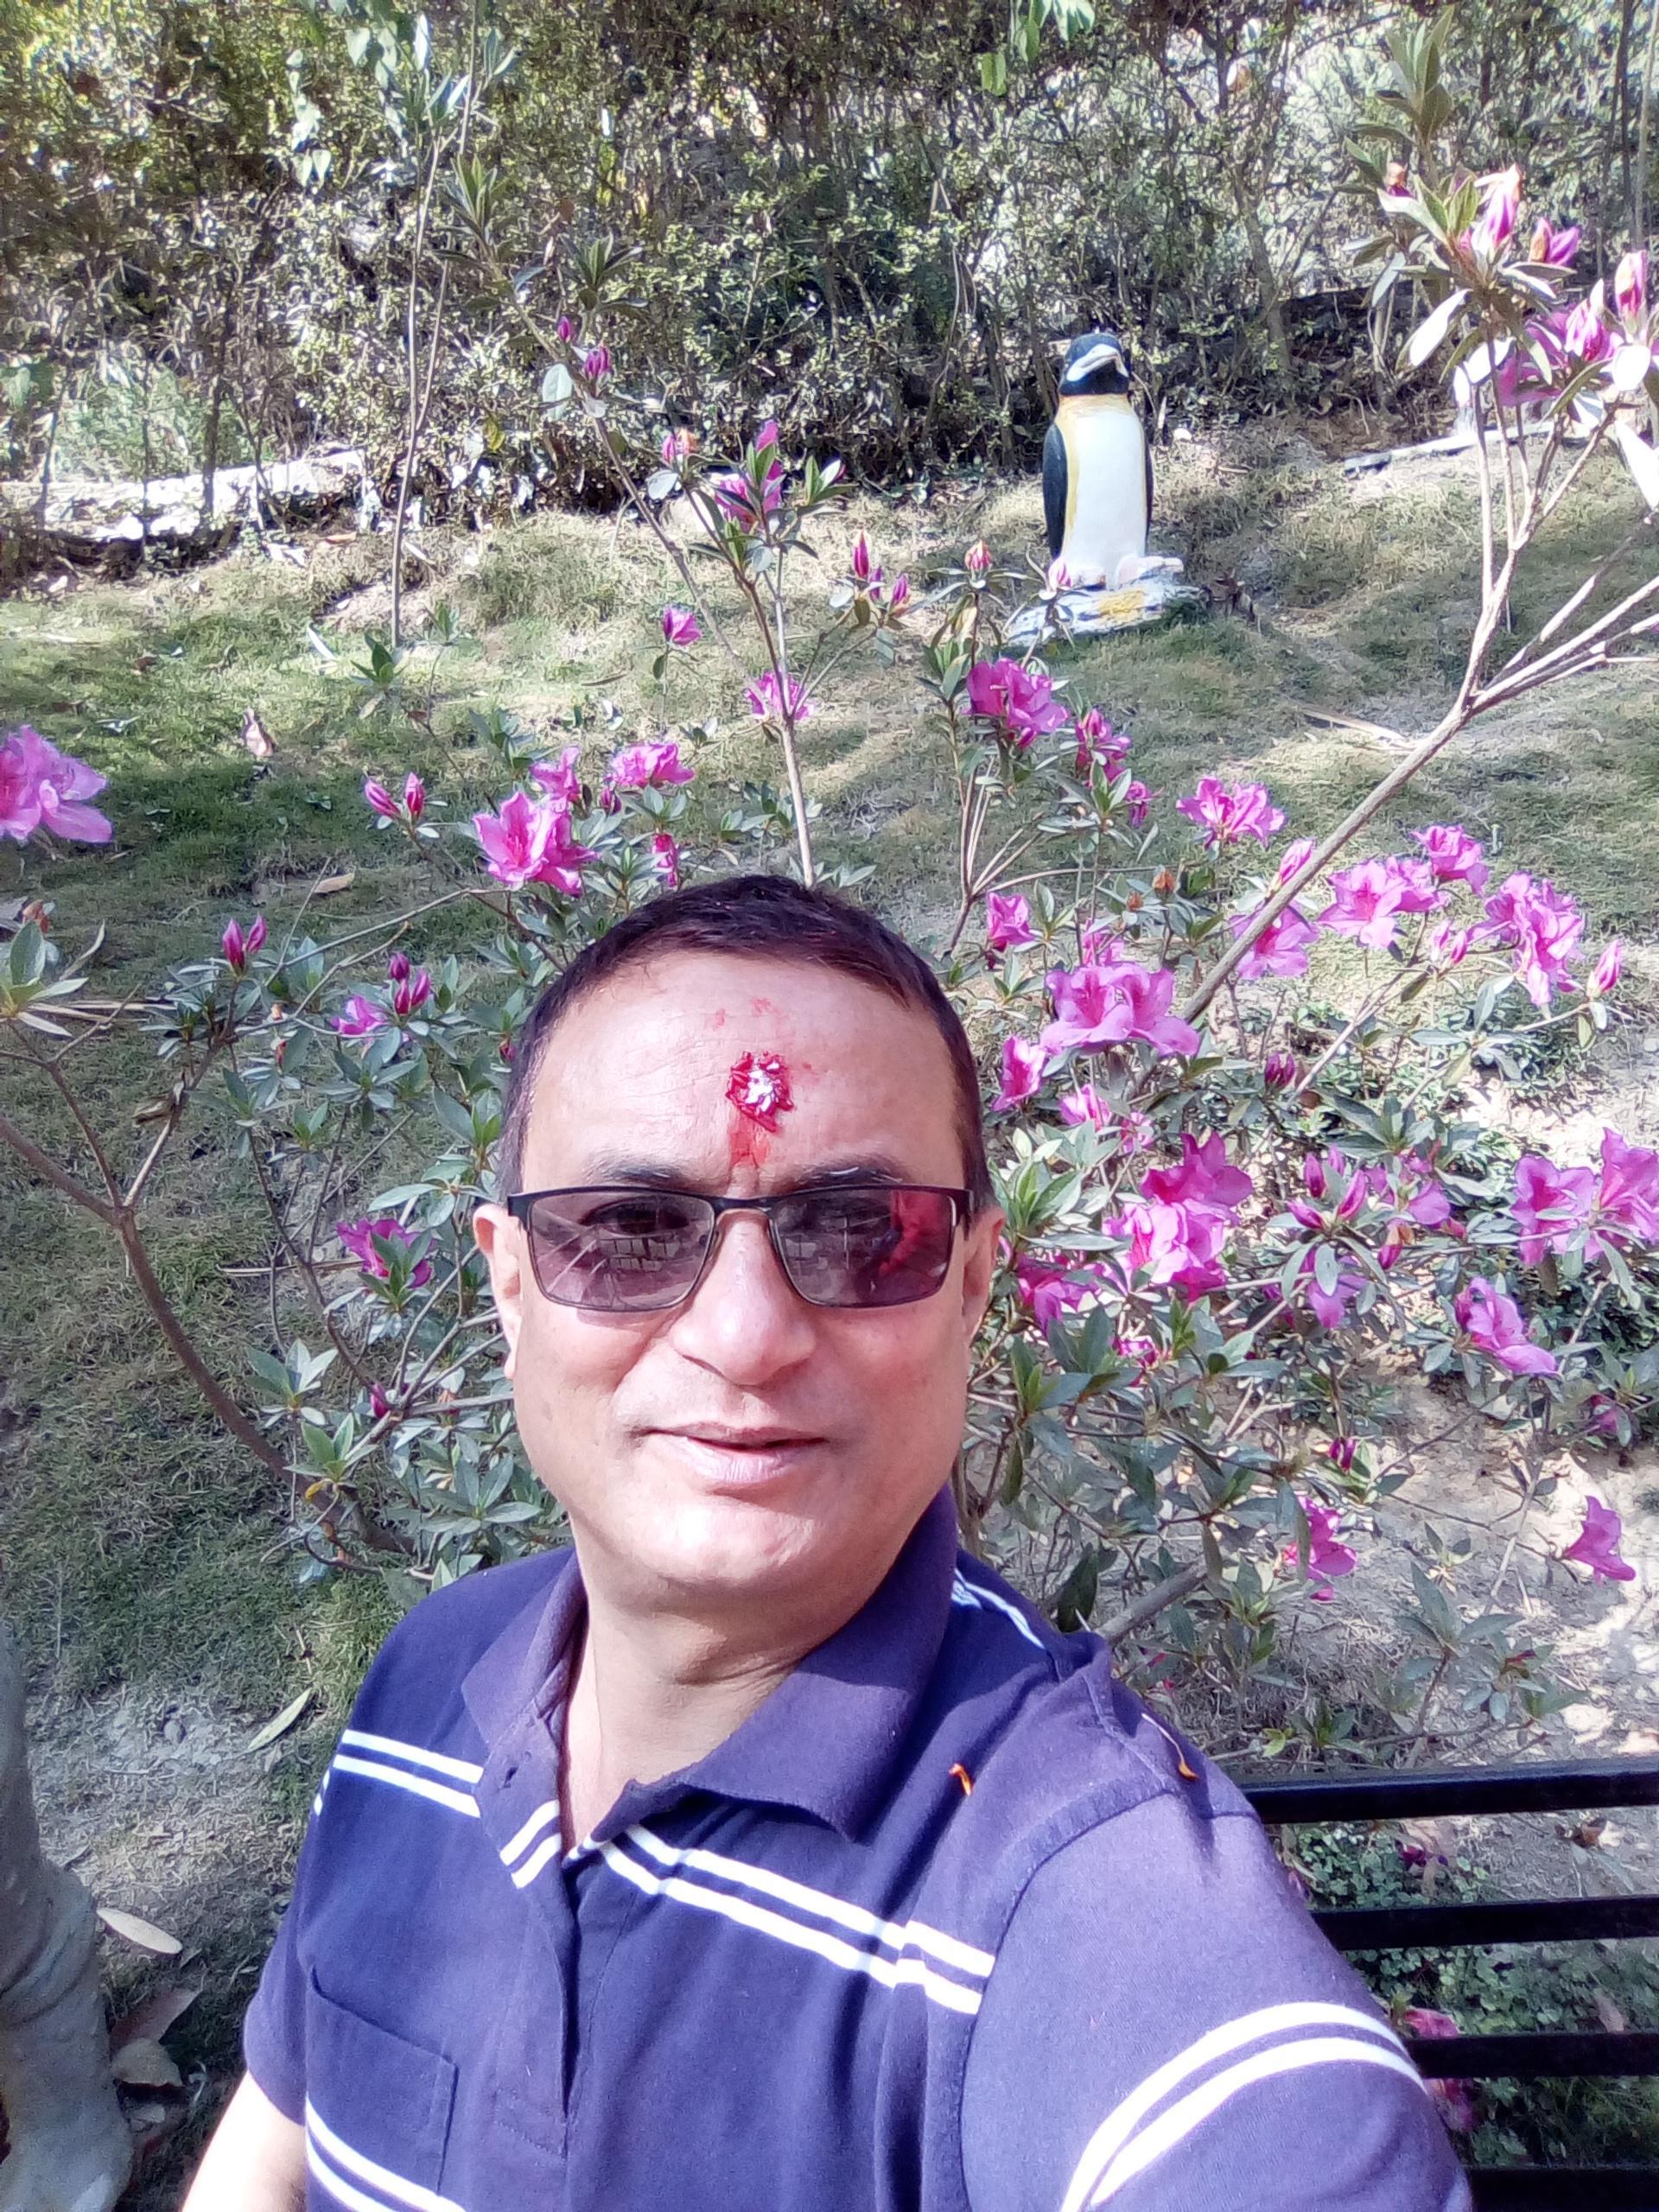 Dharmendra Lal Shrestha